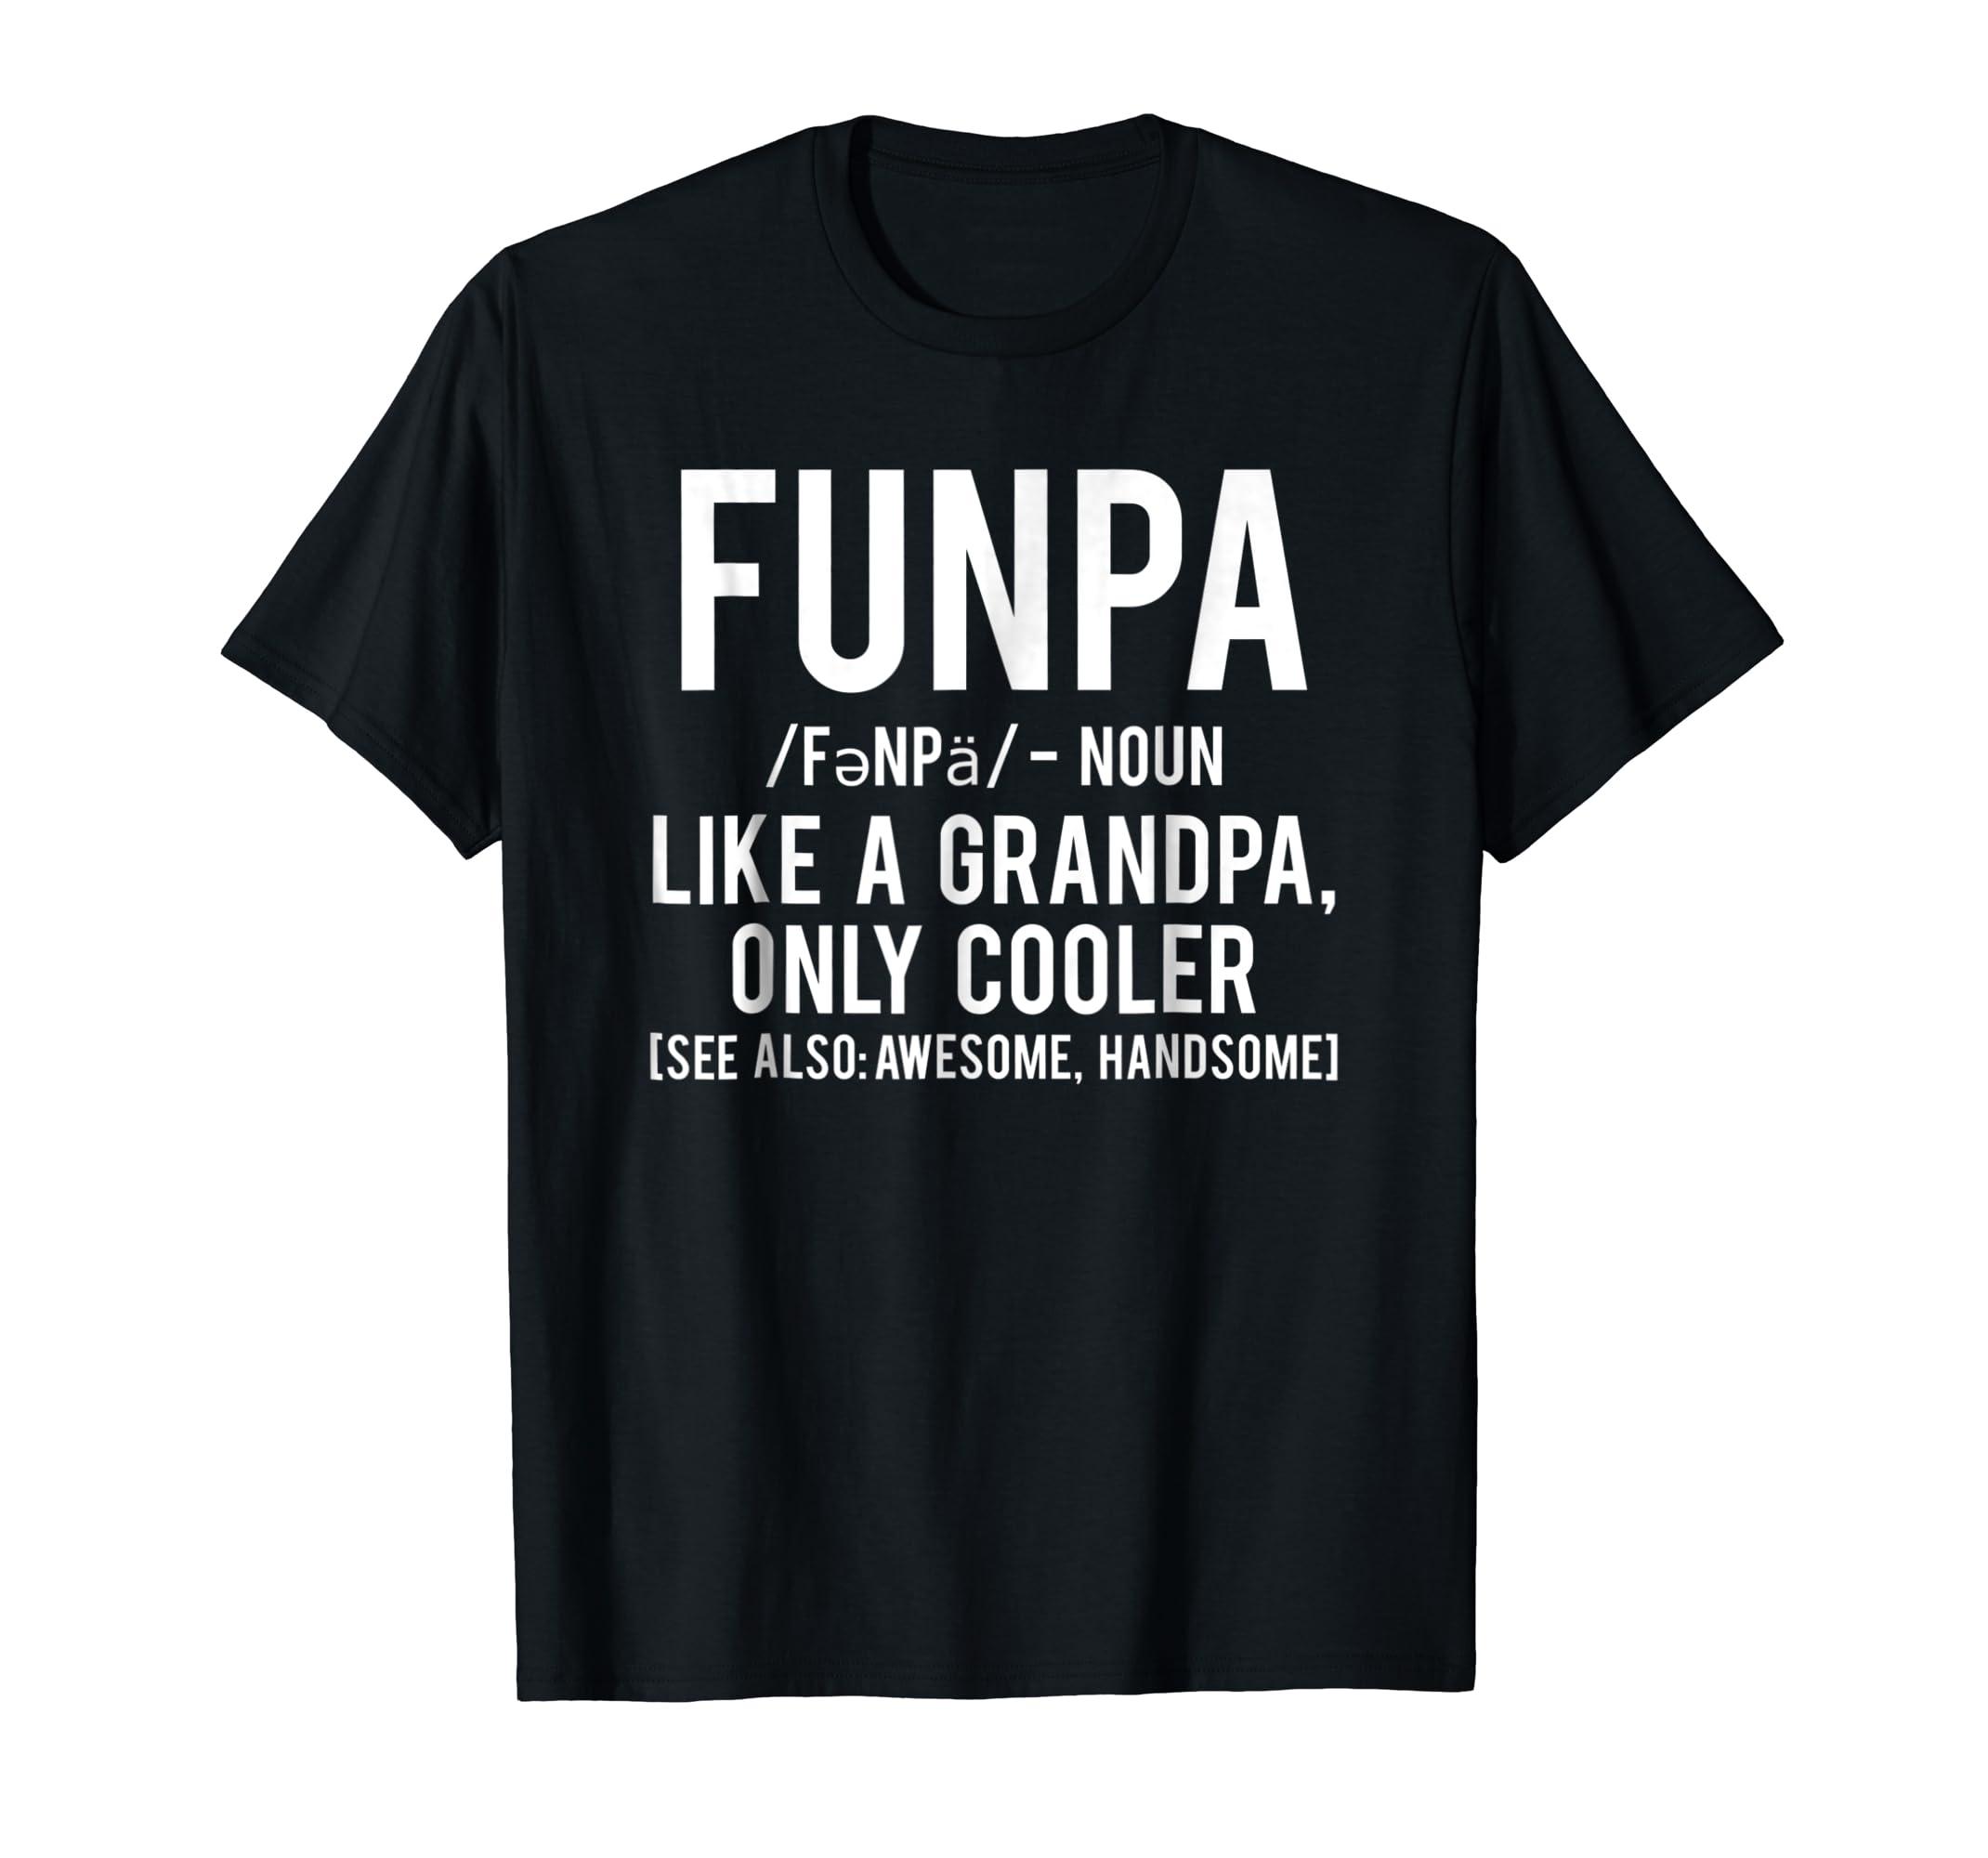 Funpa T Shirt Funny Grandpa cool grandfather papa gift tee-Men's T-Shirt-Black